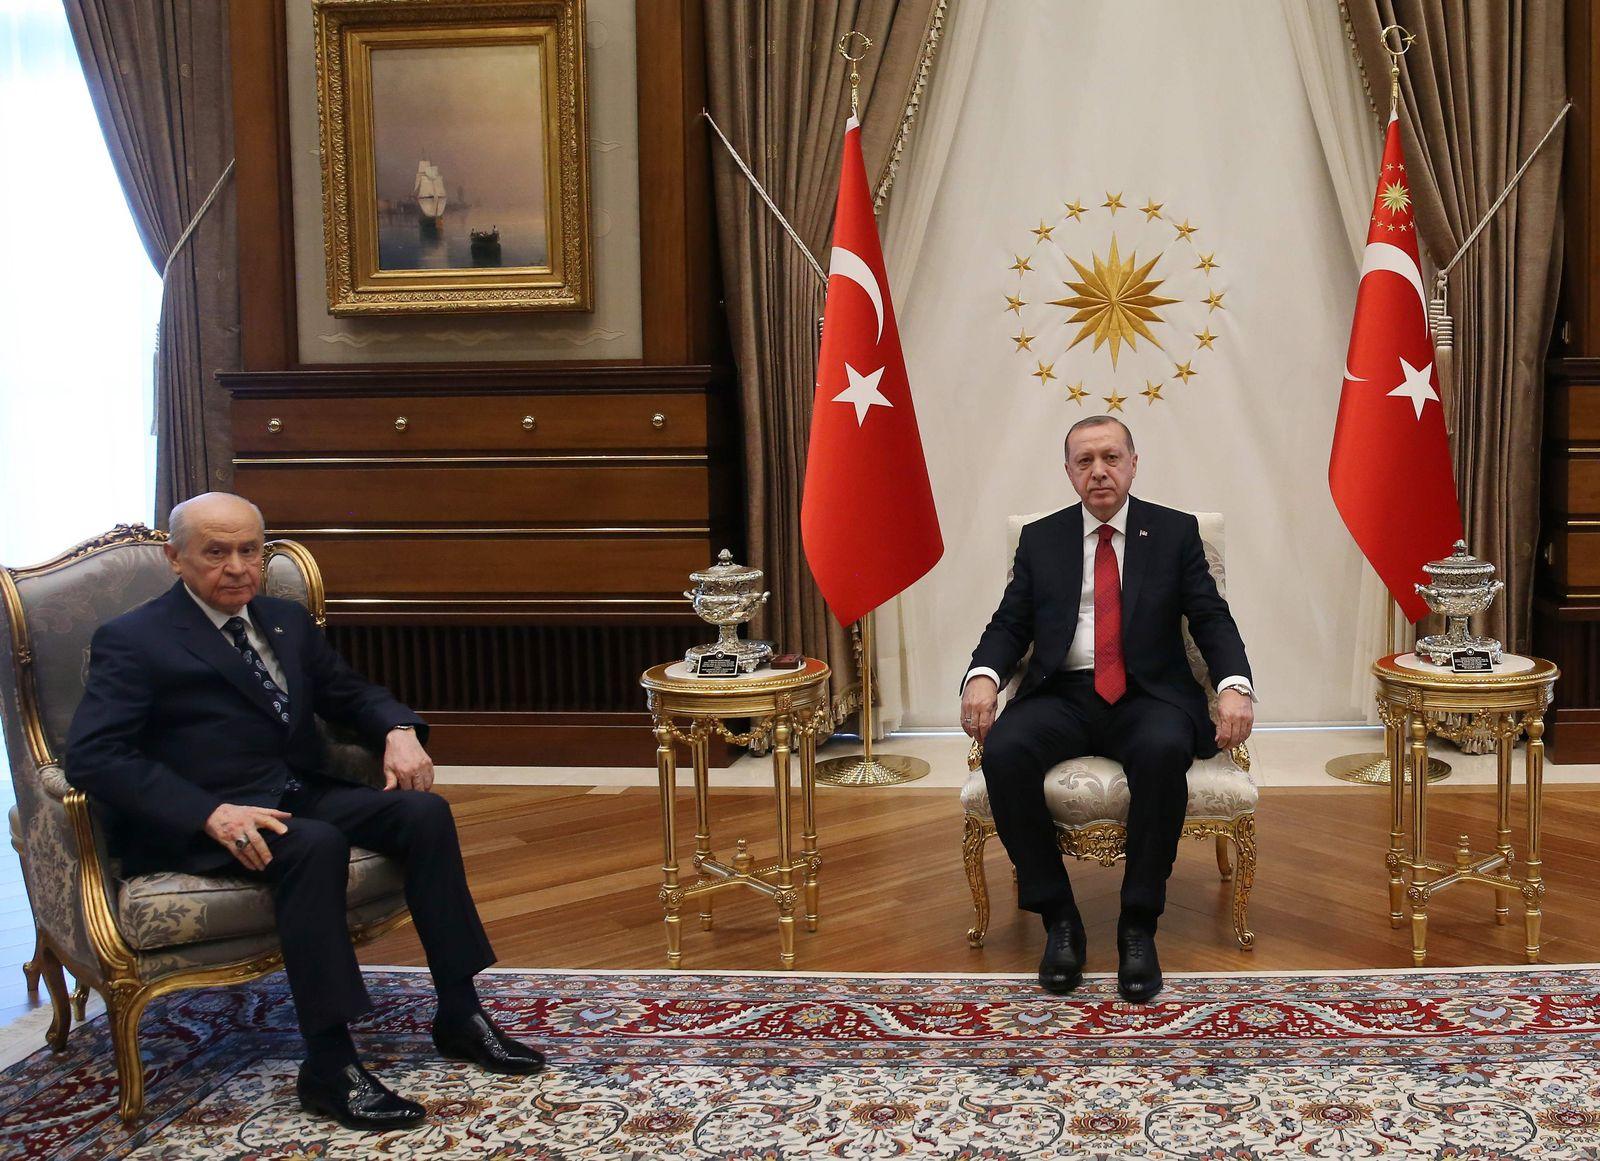 TURKEY-POLITICS-ELECTIONS-VOTE-PARTIES